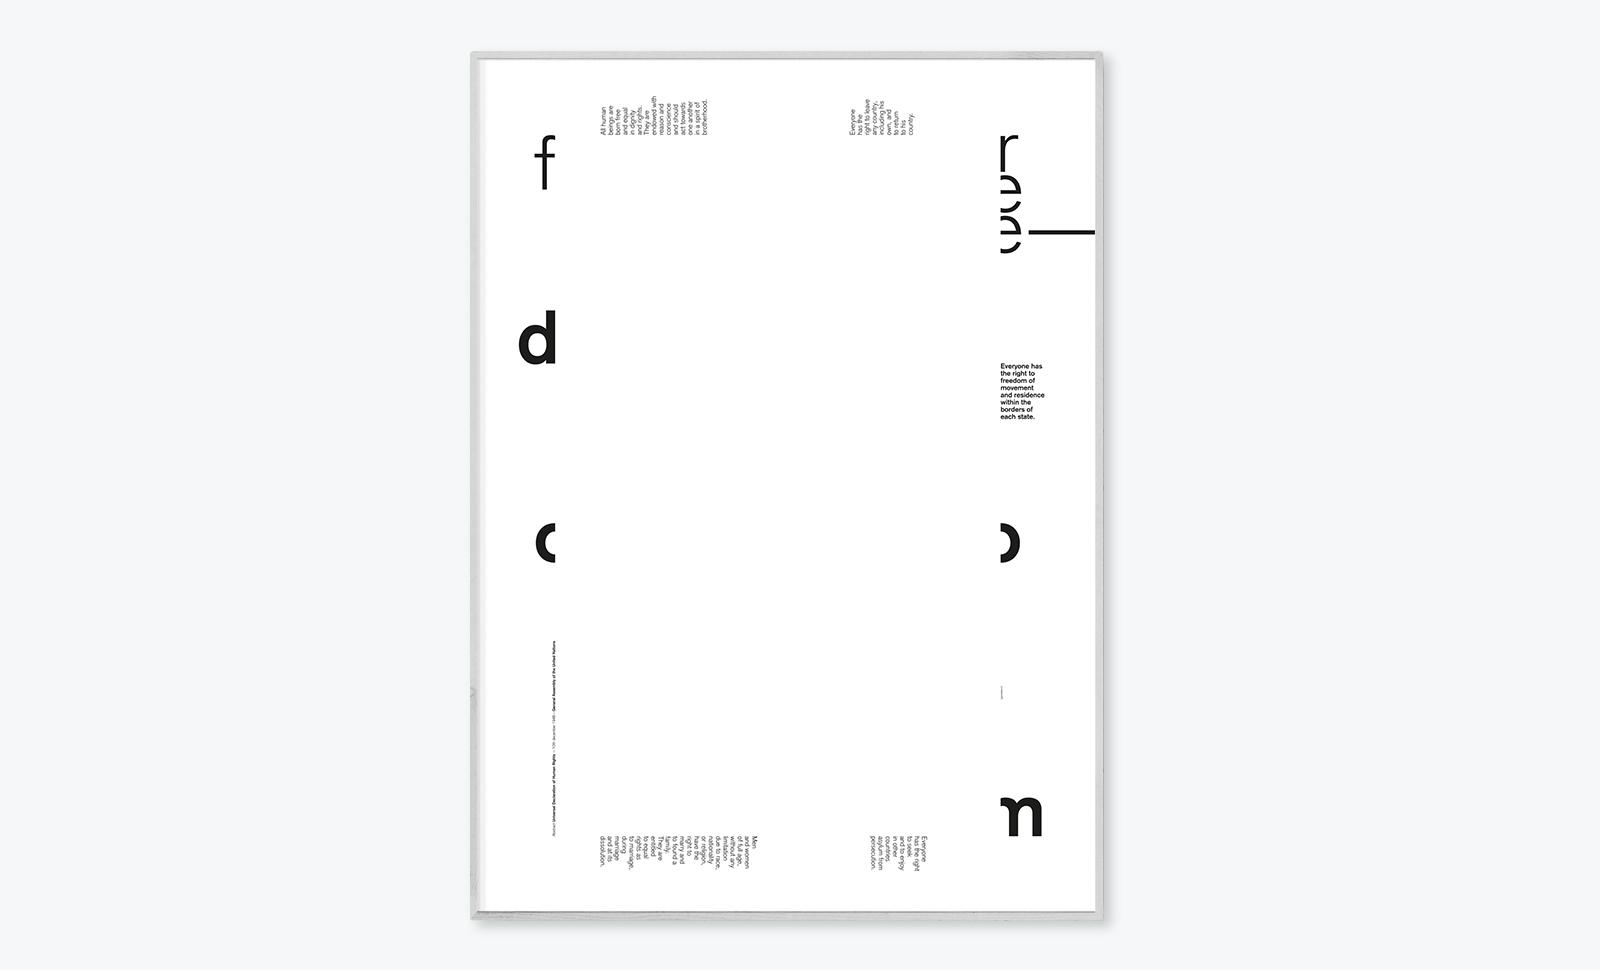 gianni latino poster freedoom